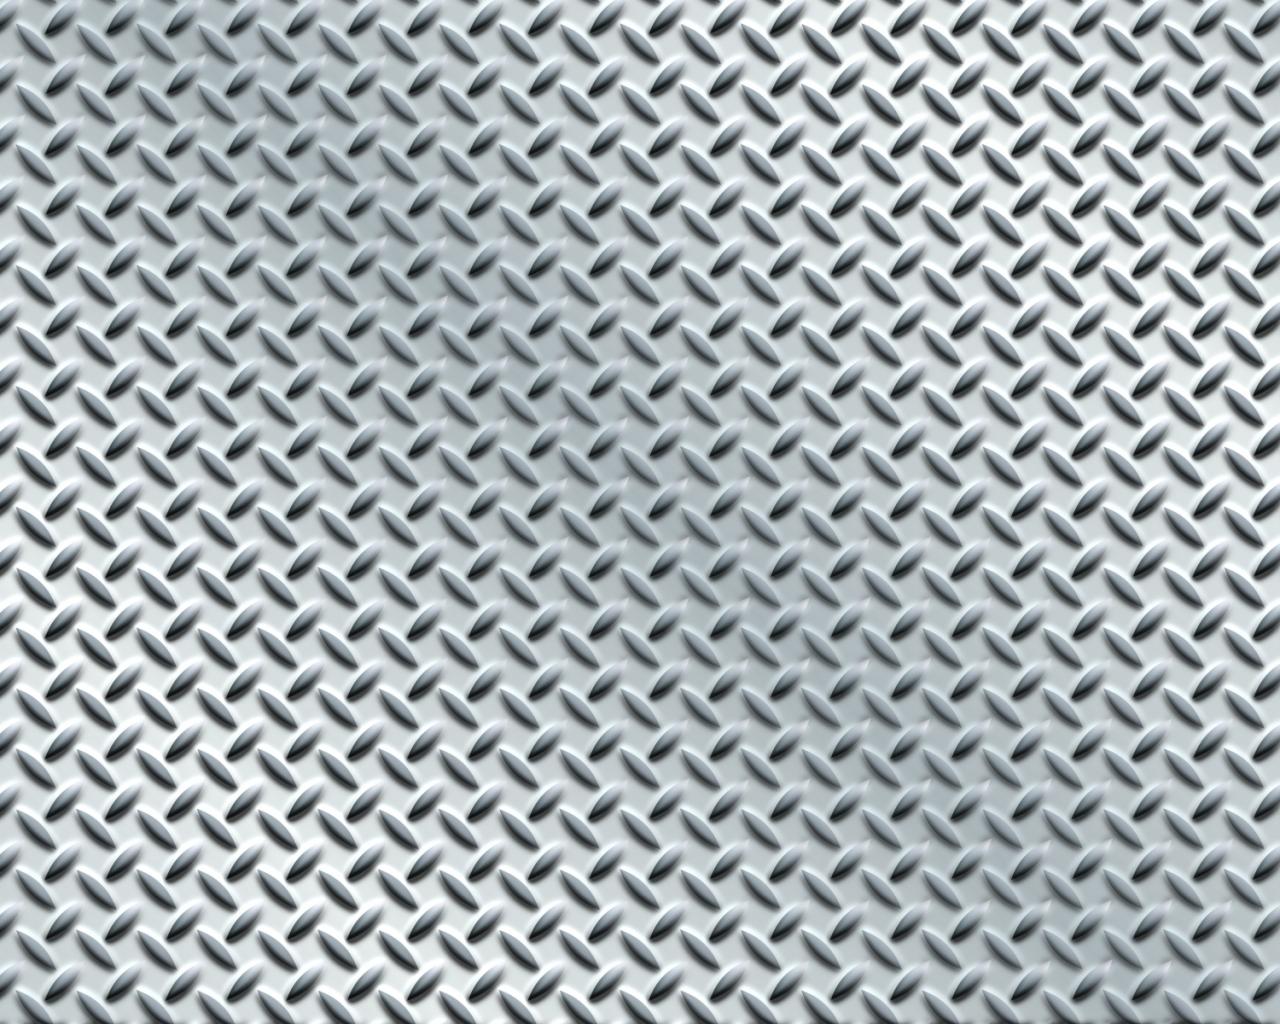 Textura de plancha metal hd 1280x1024 imagenes - Planchas de metal ...